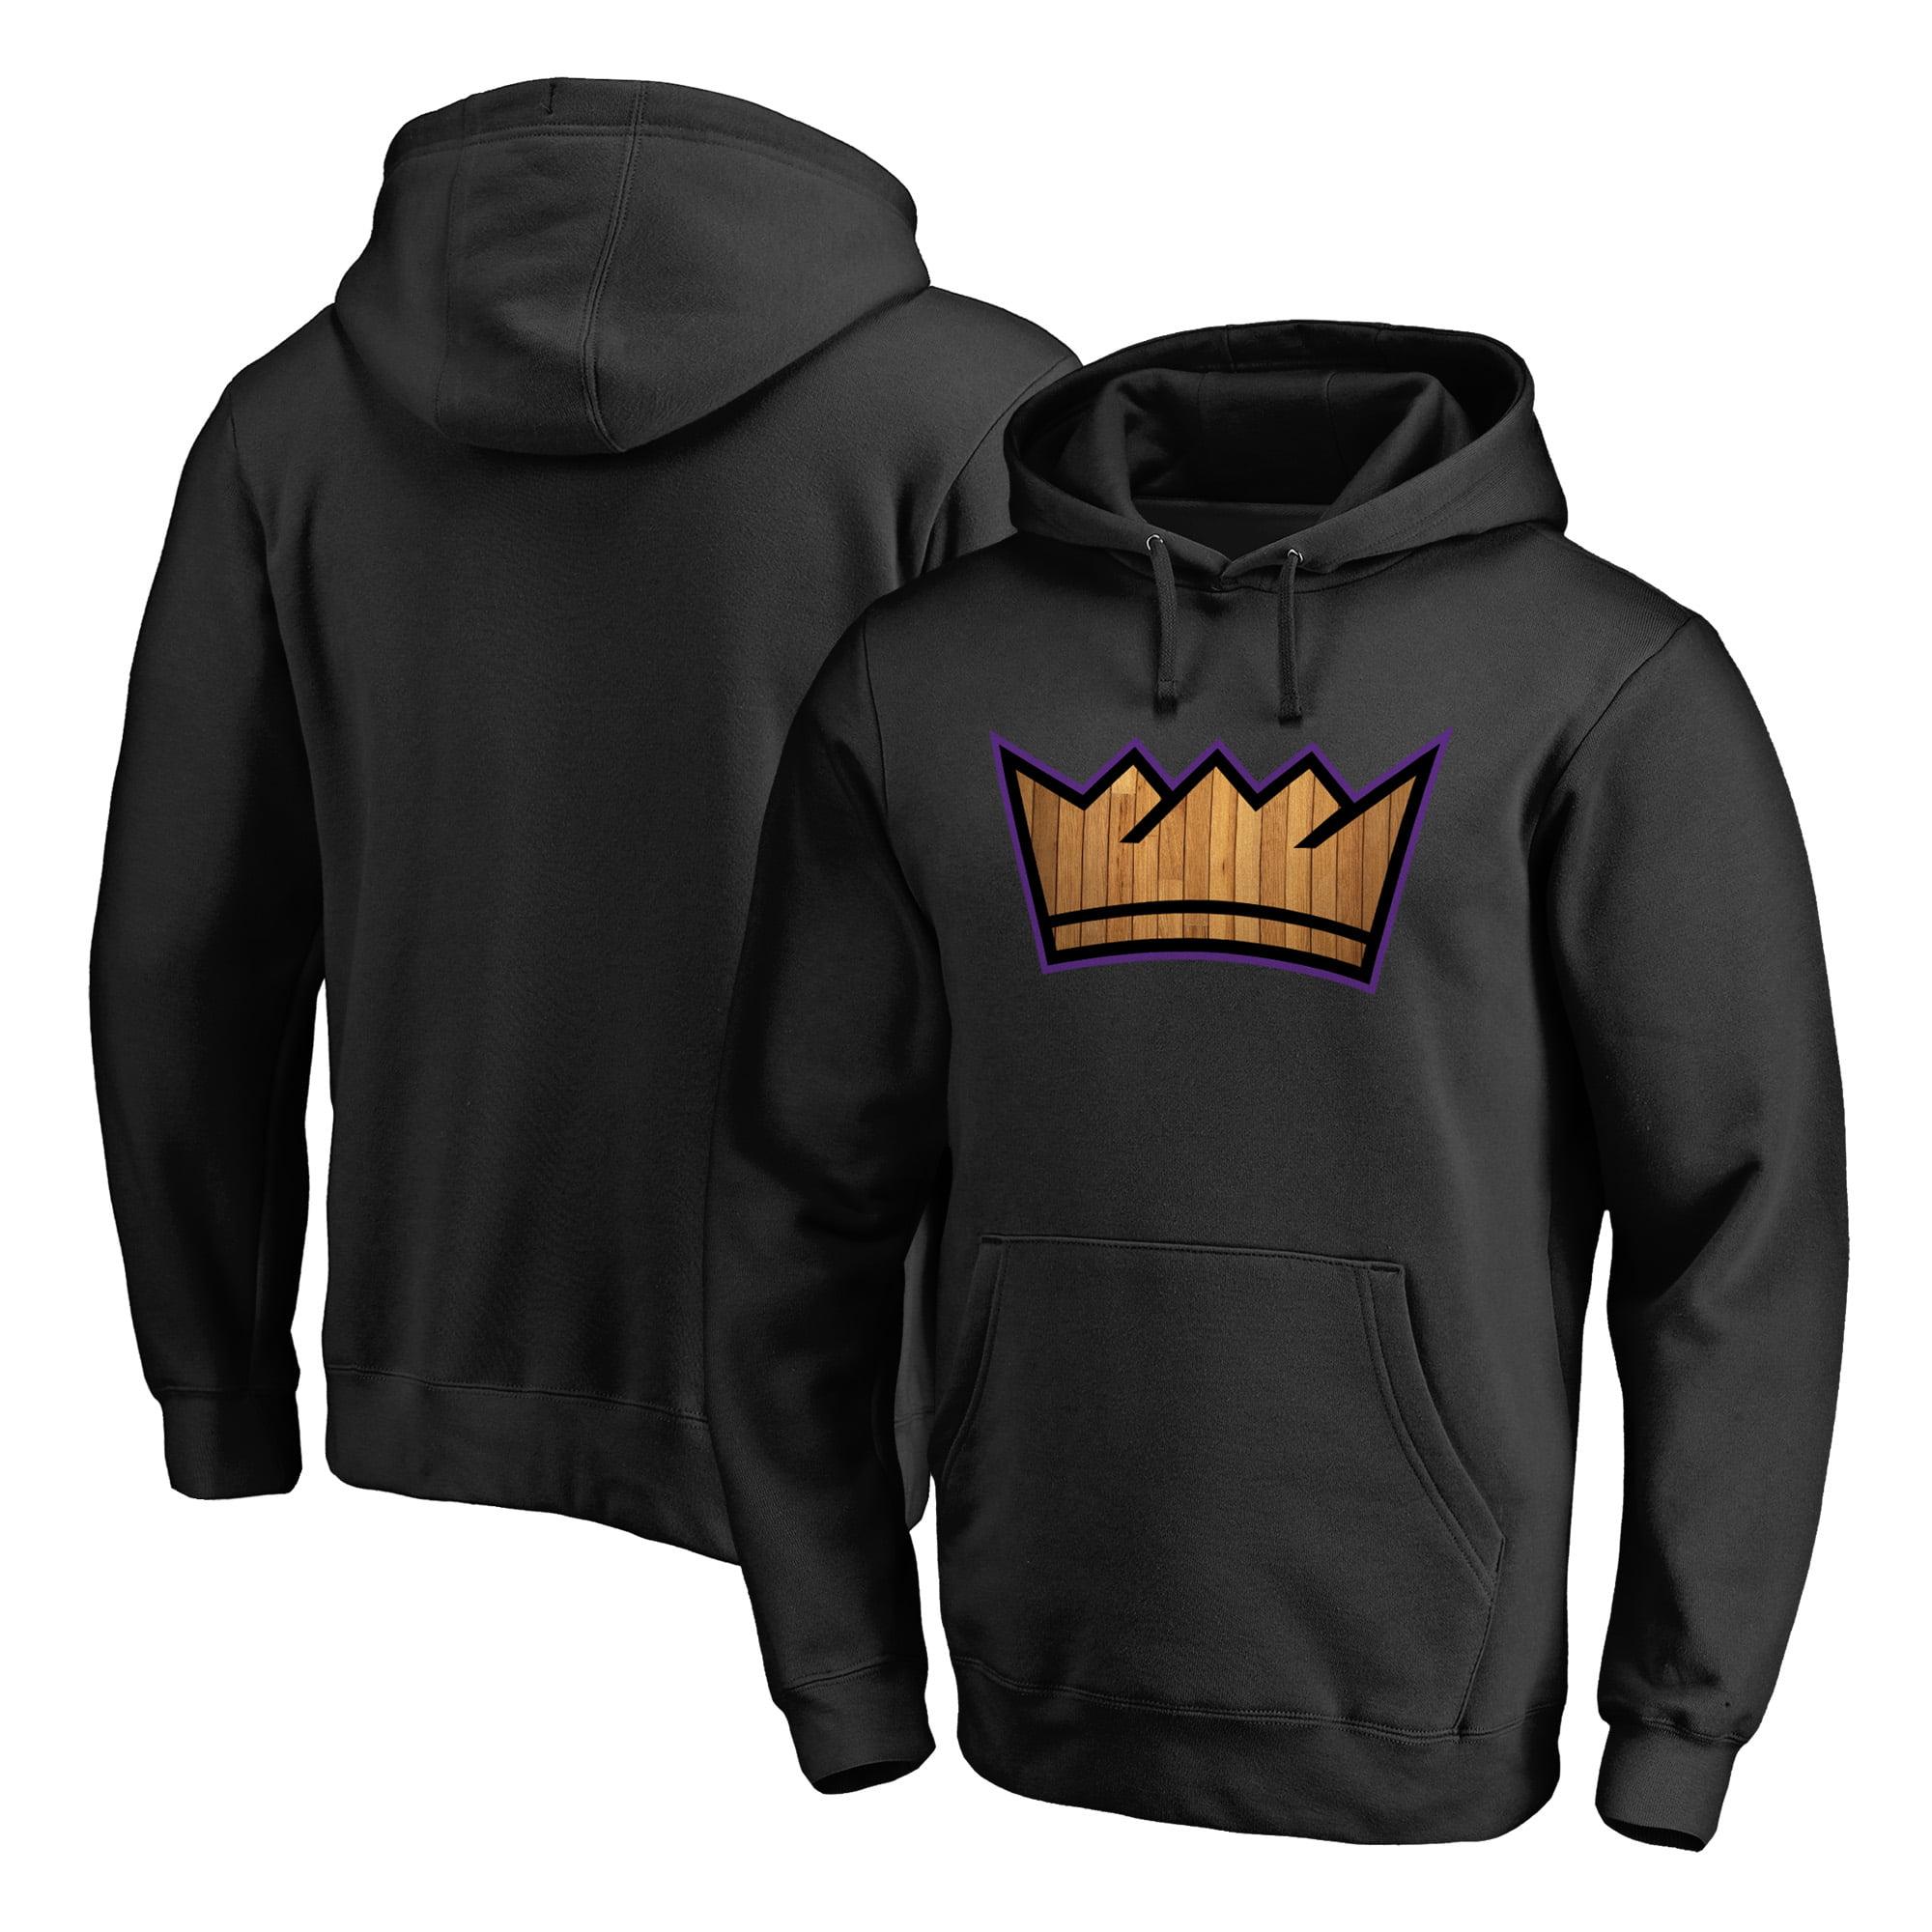 Sacramento Kings Fanatics Branded Hardwood Pullover Hoodie - Black